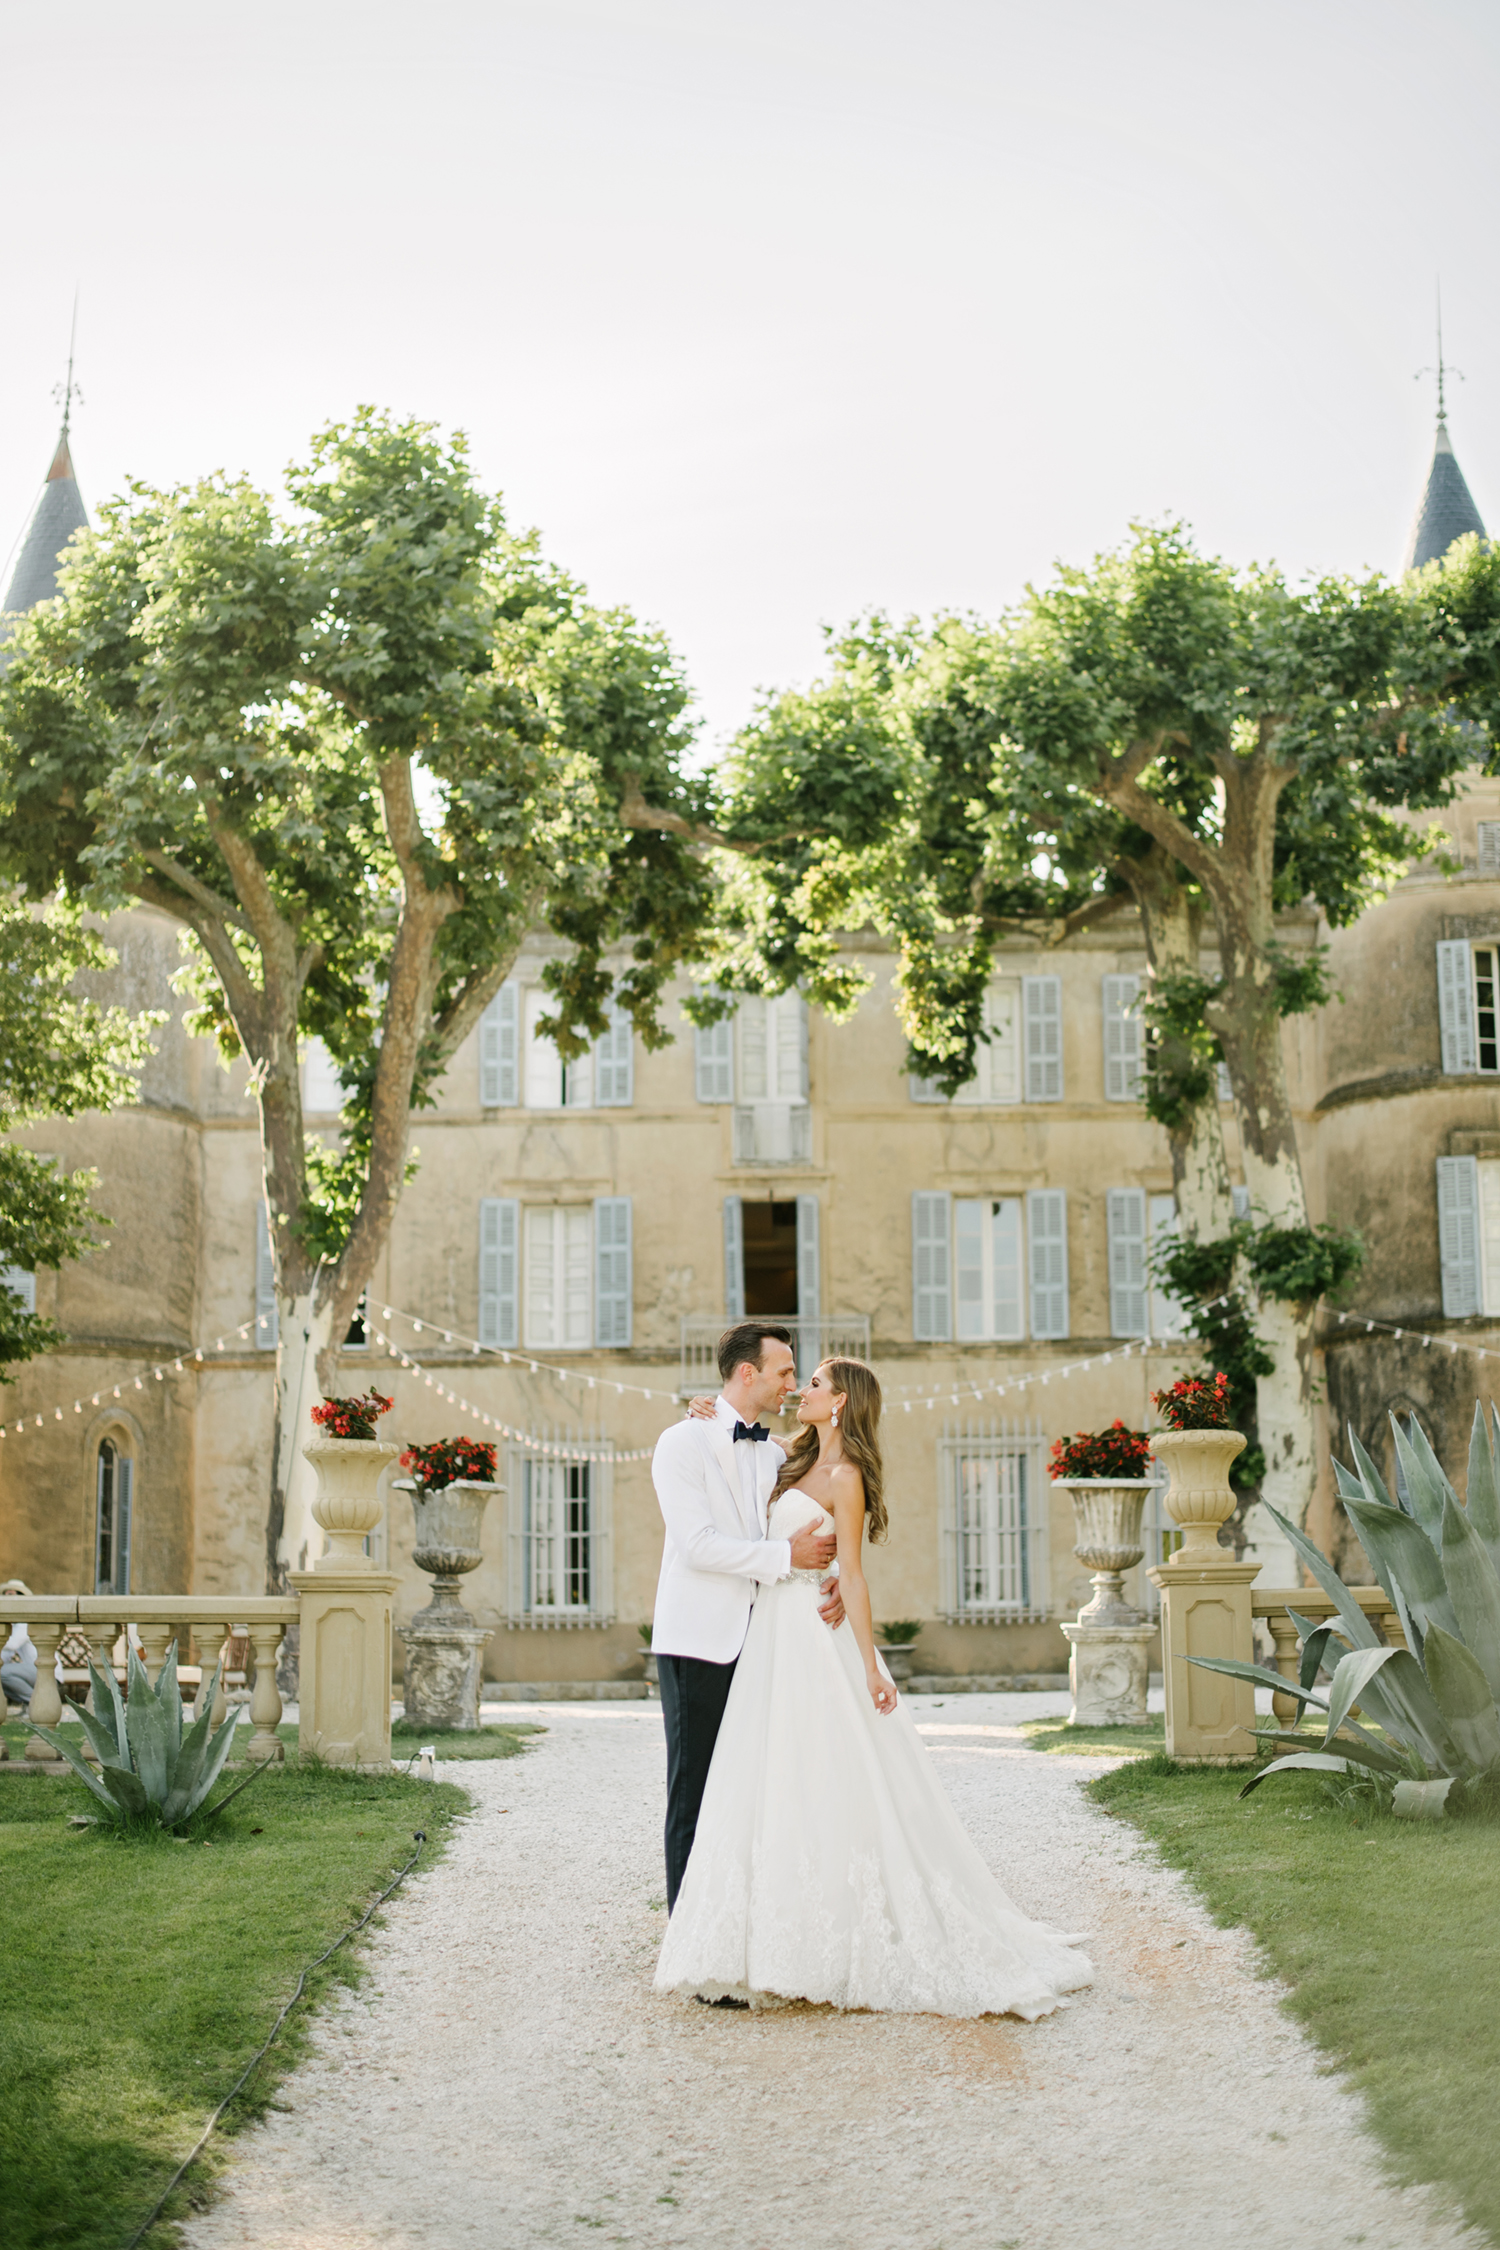 Chateau-Robernier-Wedding-Photographer-0122.jpg